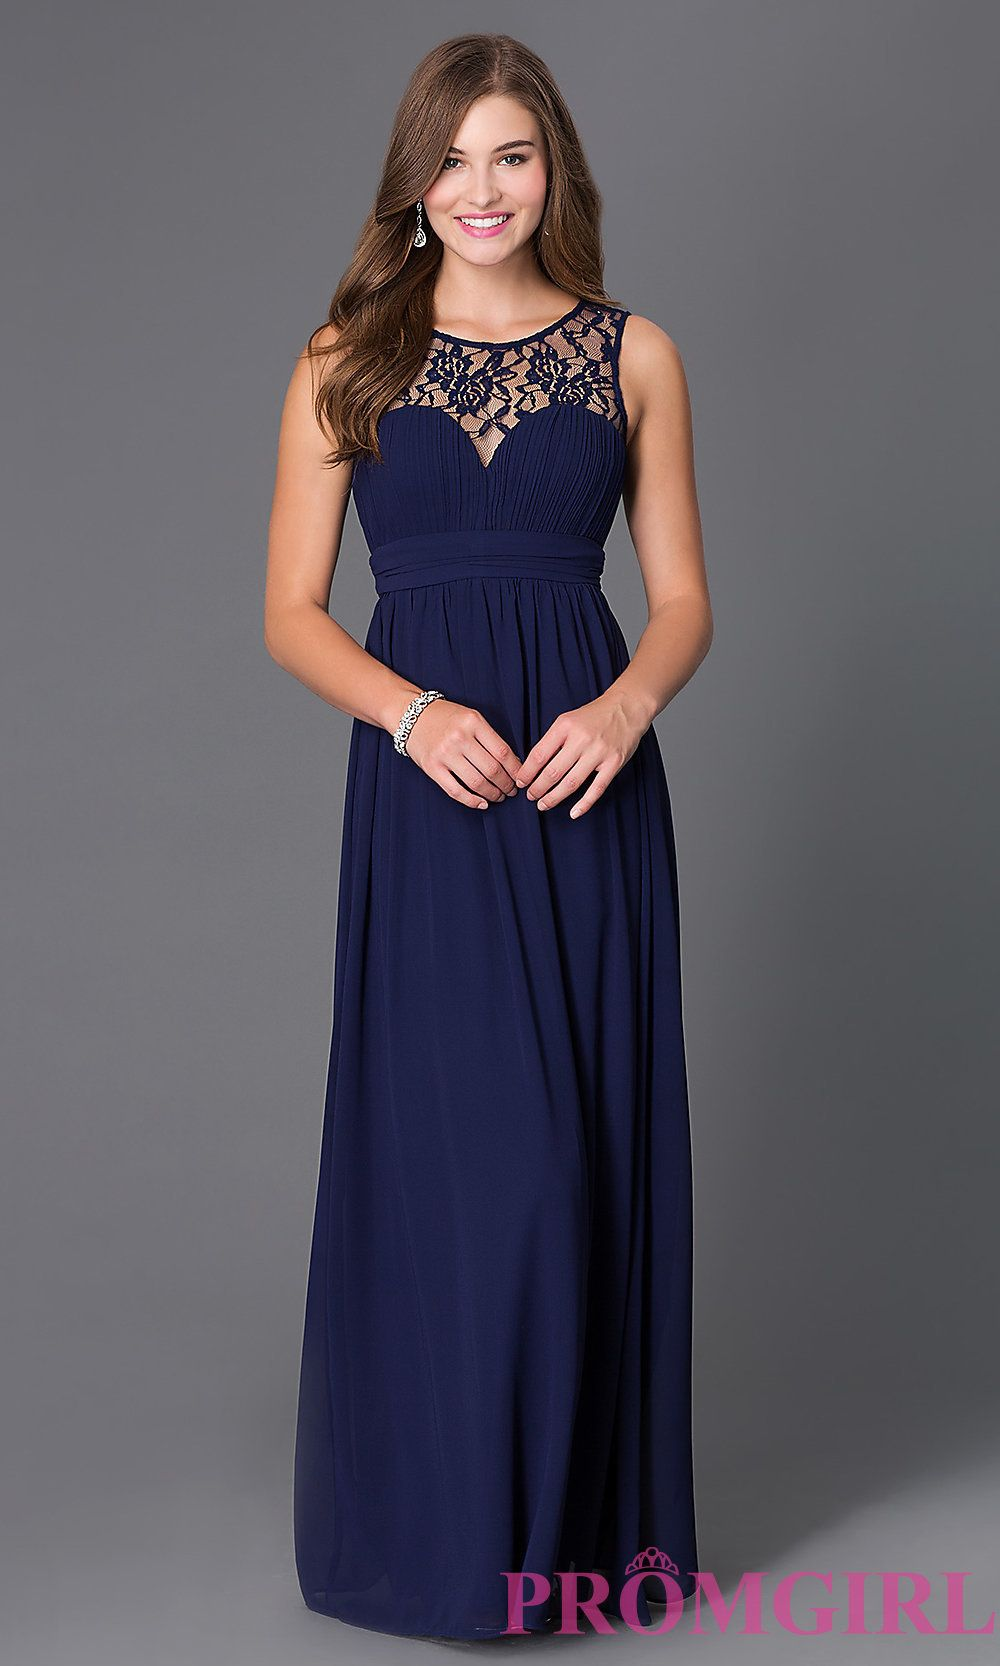 Sleeveless floor length dress with lace embellished neckline